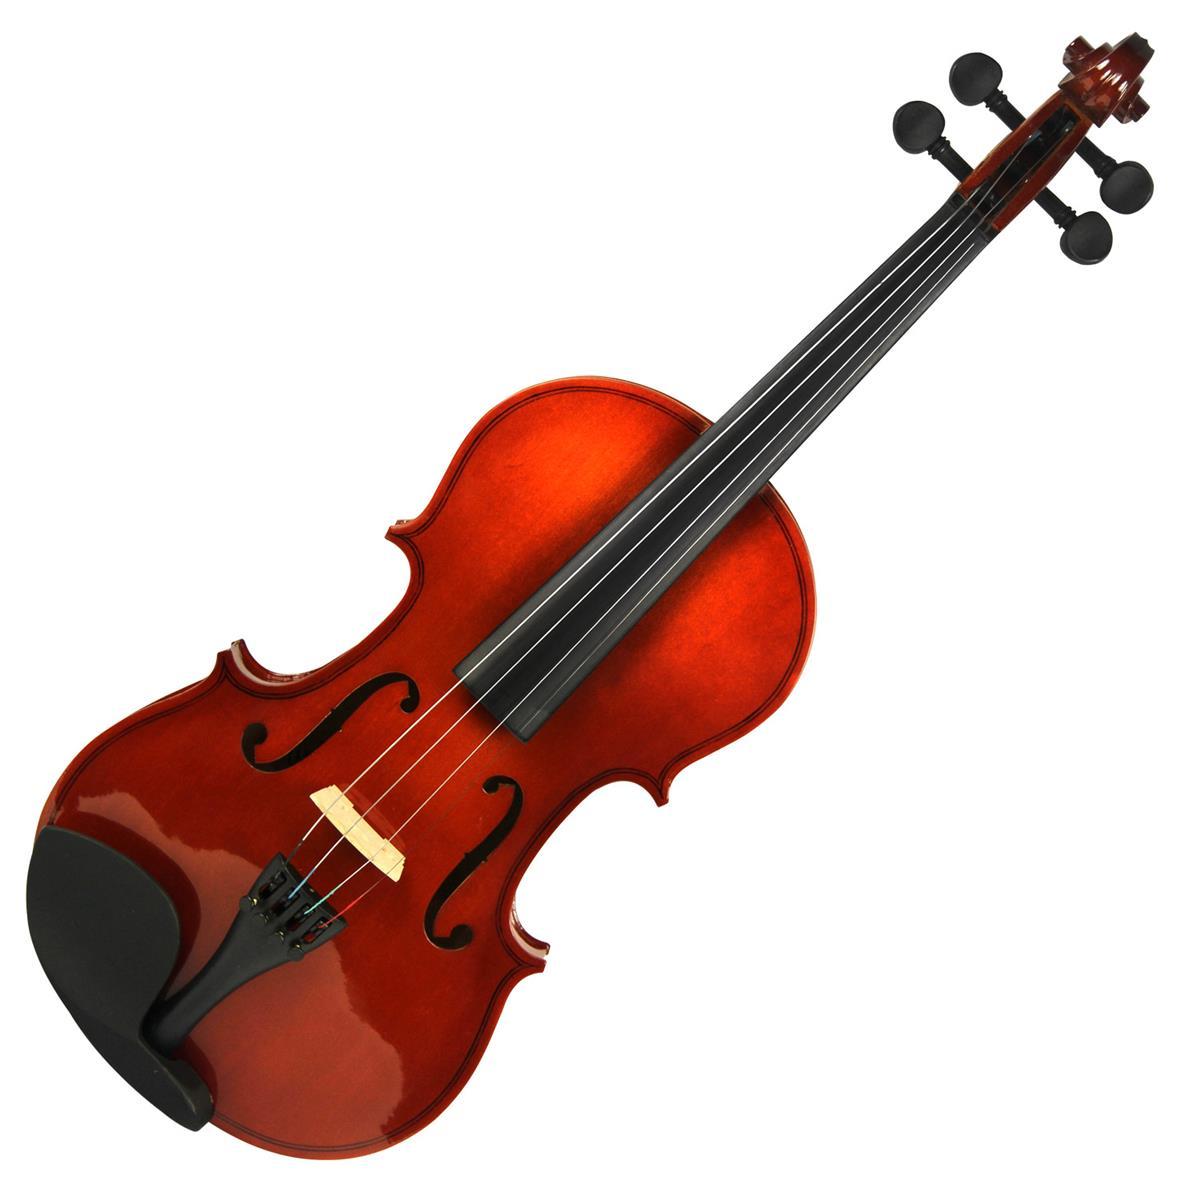 Violino Clássico 4 / 4 Acústico Aubvl14 Auburn